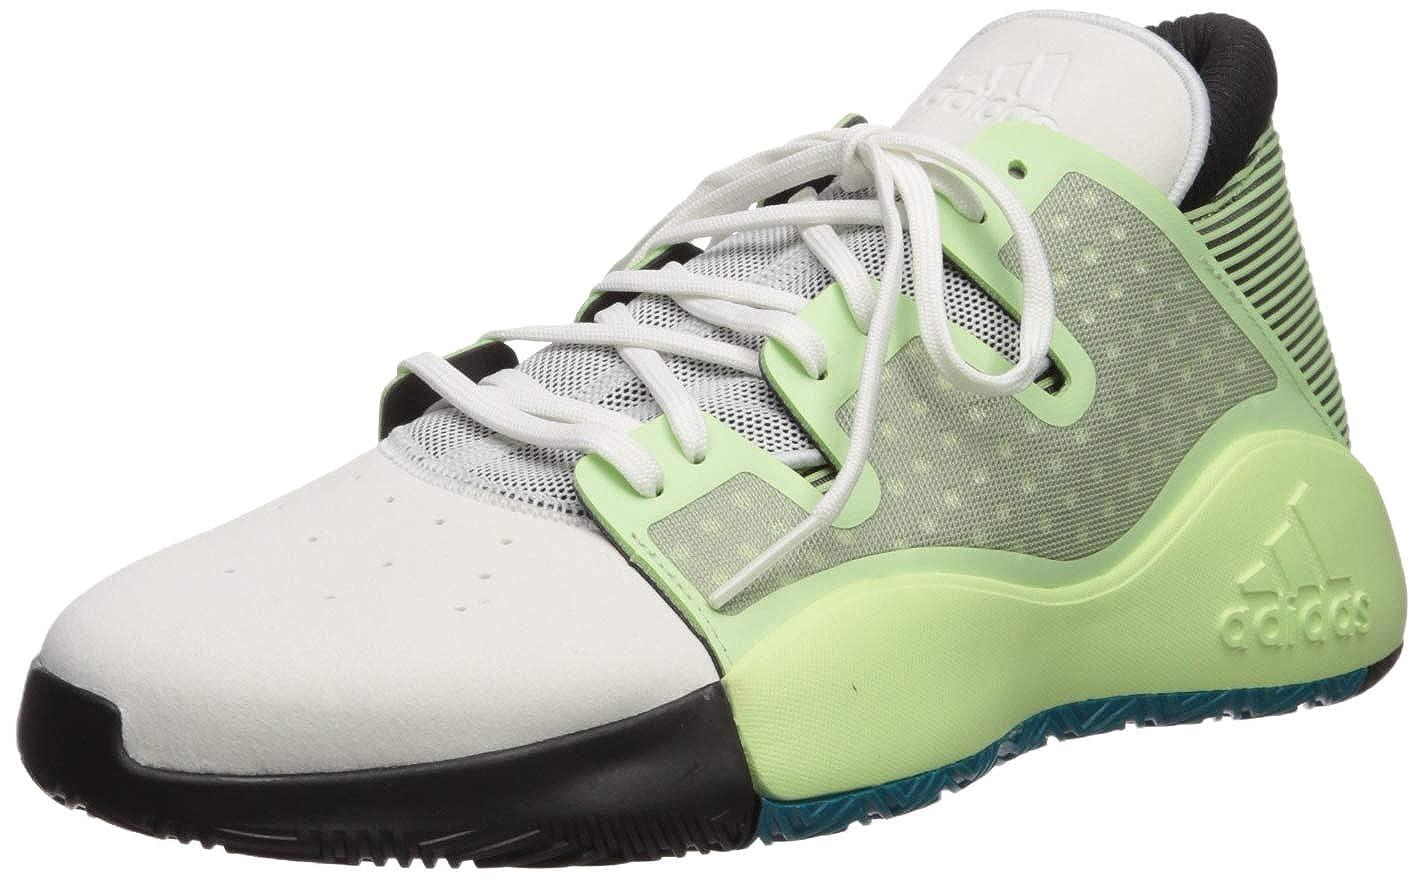 Glow vert Crystal blanc noir adidas - Pro Vision Homme 44.5 EU